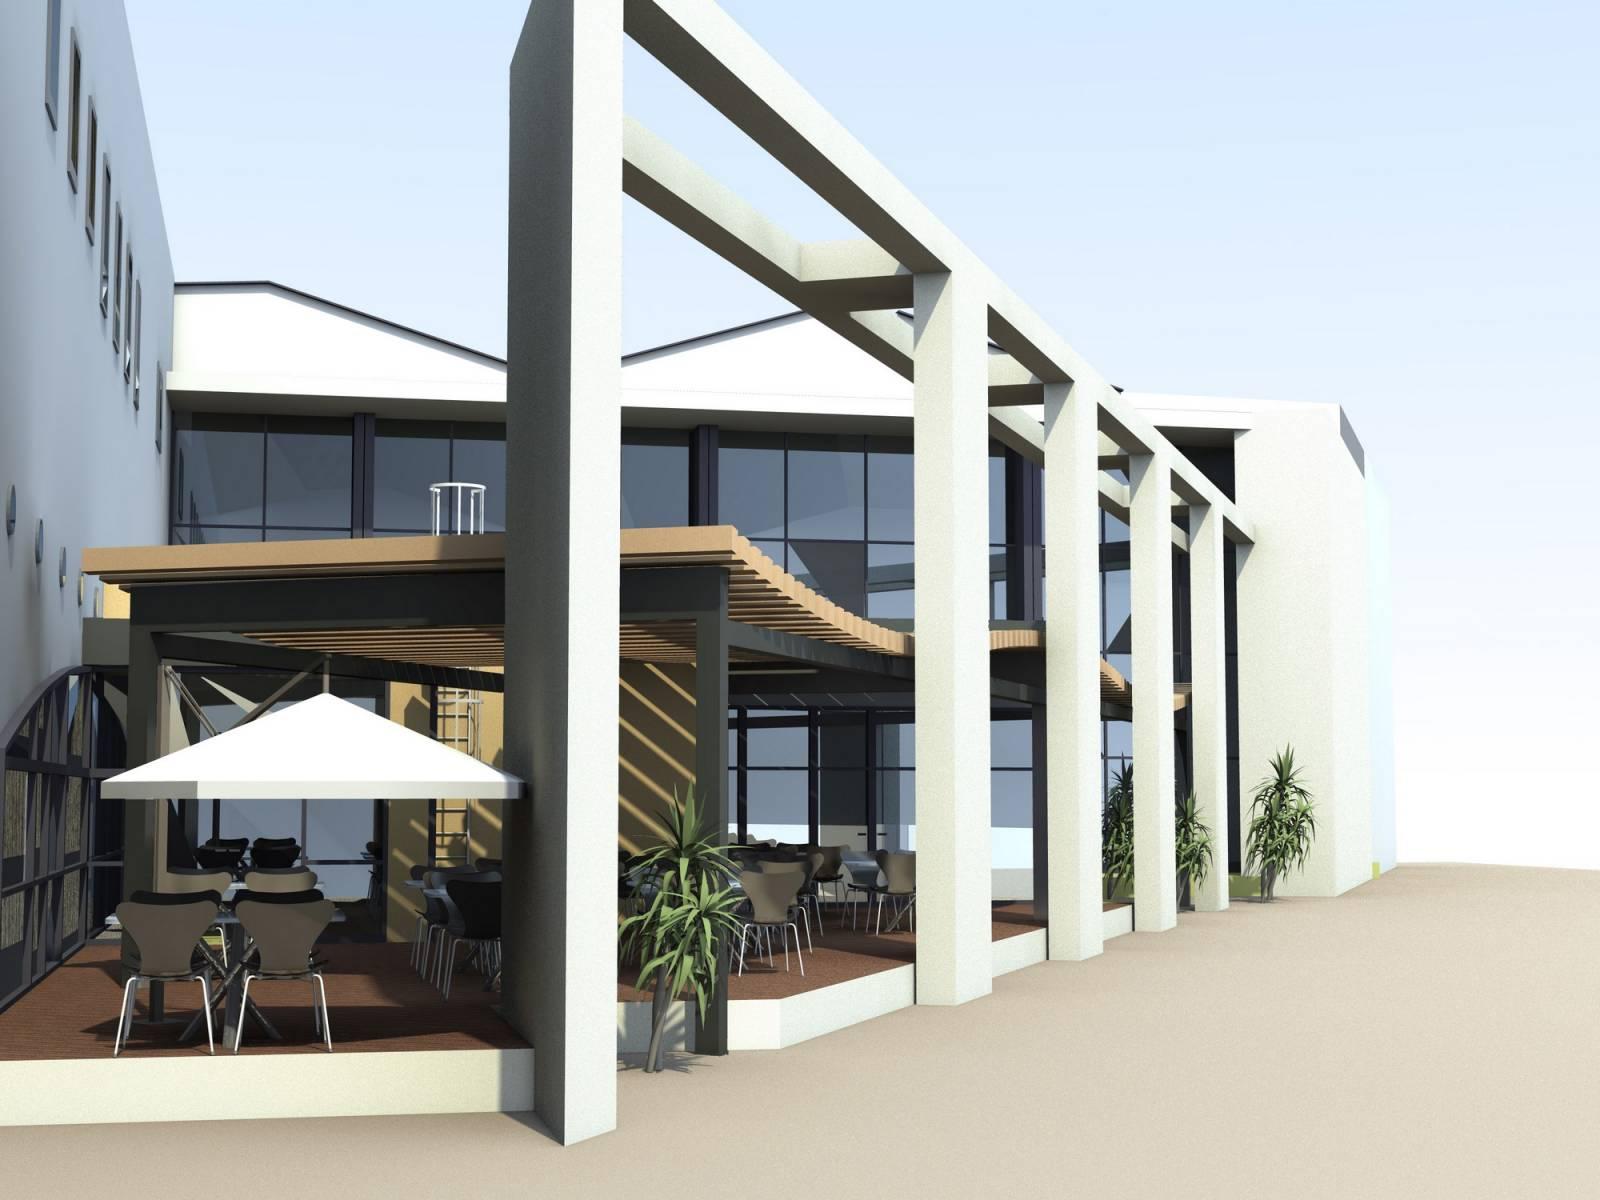 architecte dplg sur aix en provence. Black Bedroom Furniture Sets. Home Design Ideas